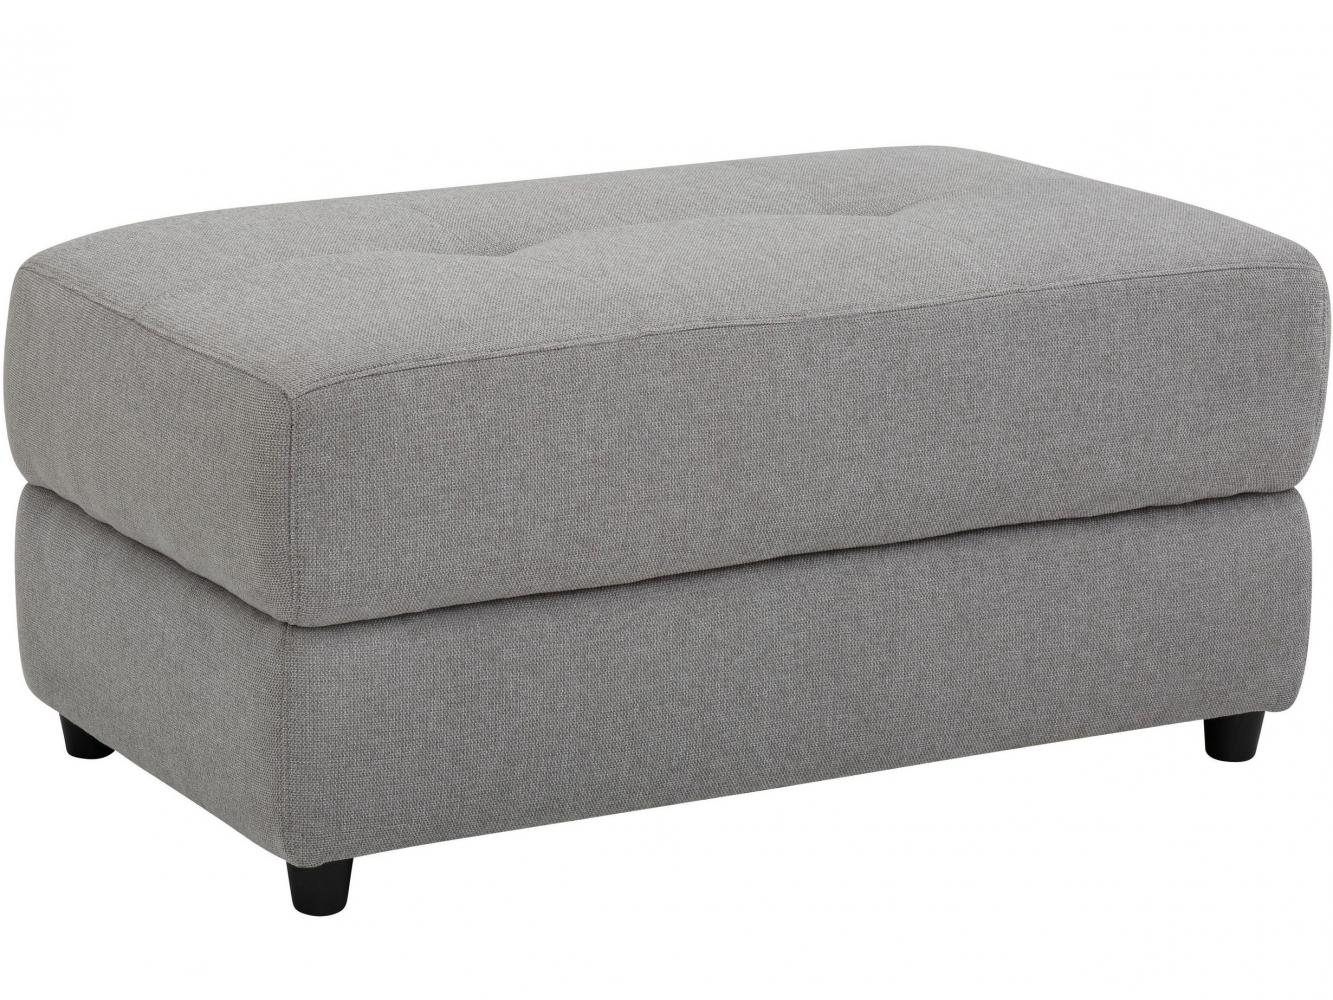 Lavice Cepan, 105 cm, textil, šedá